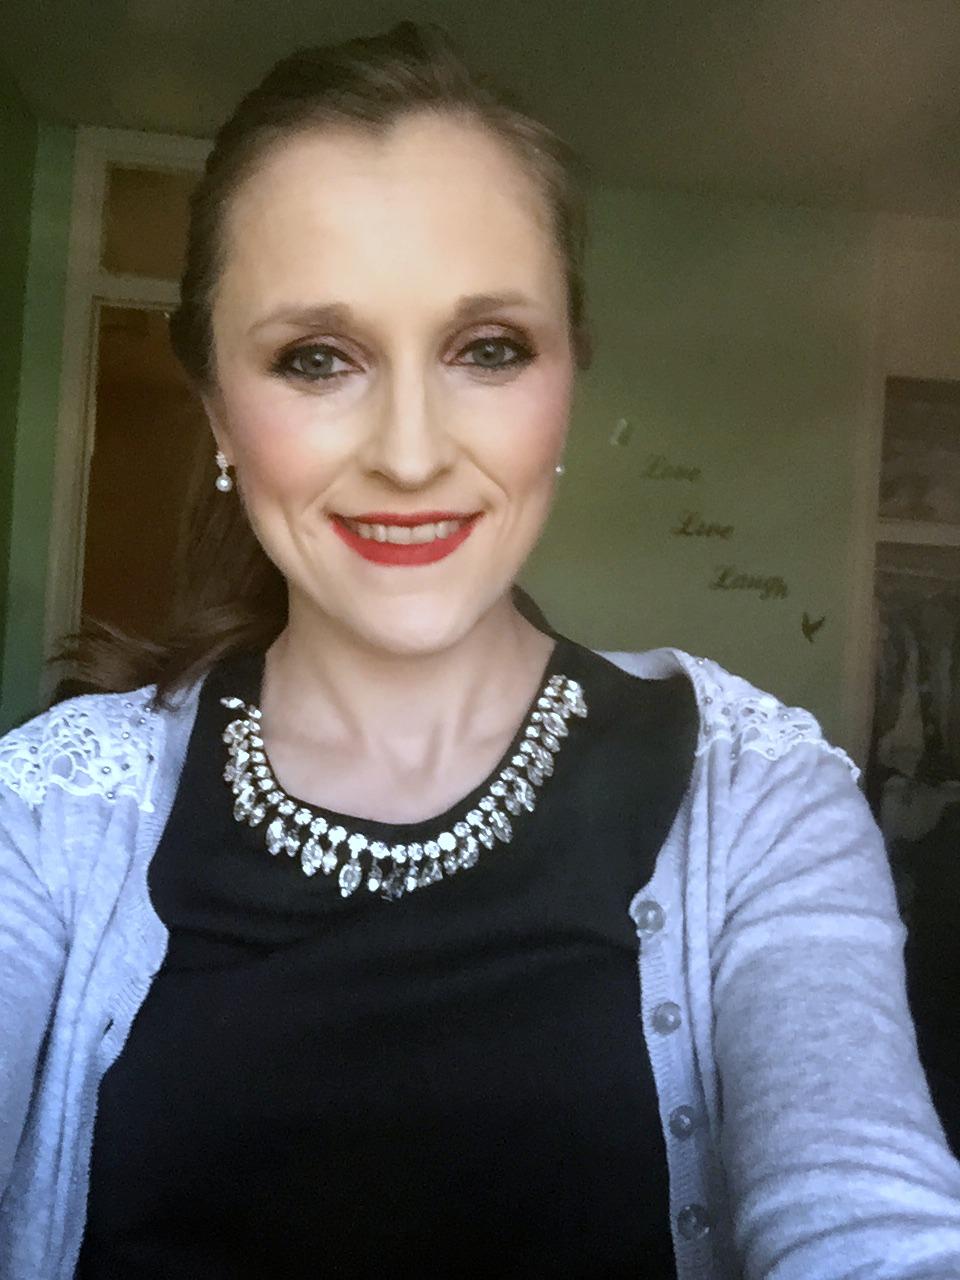 wearing makeup revolution retro luxe lip kits in regal